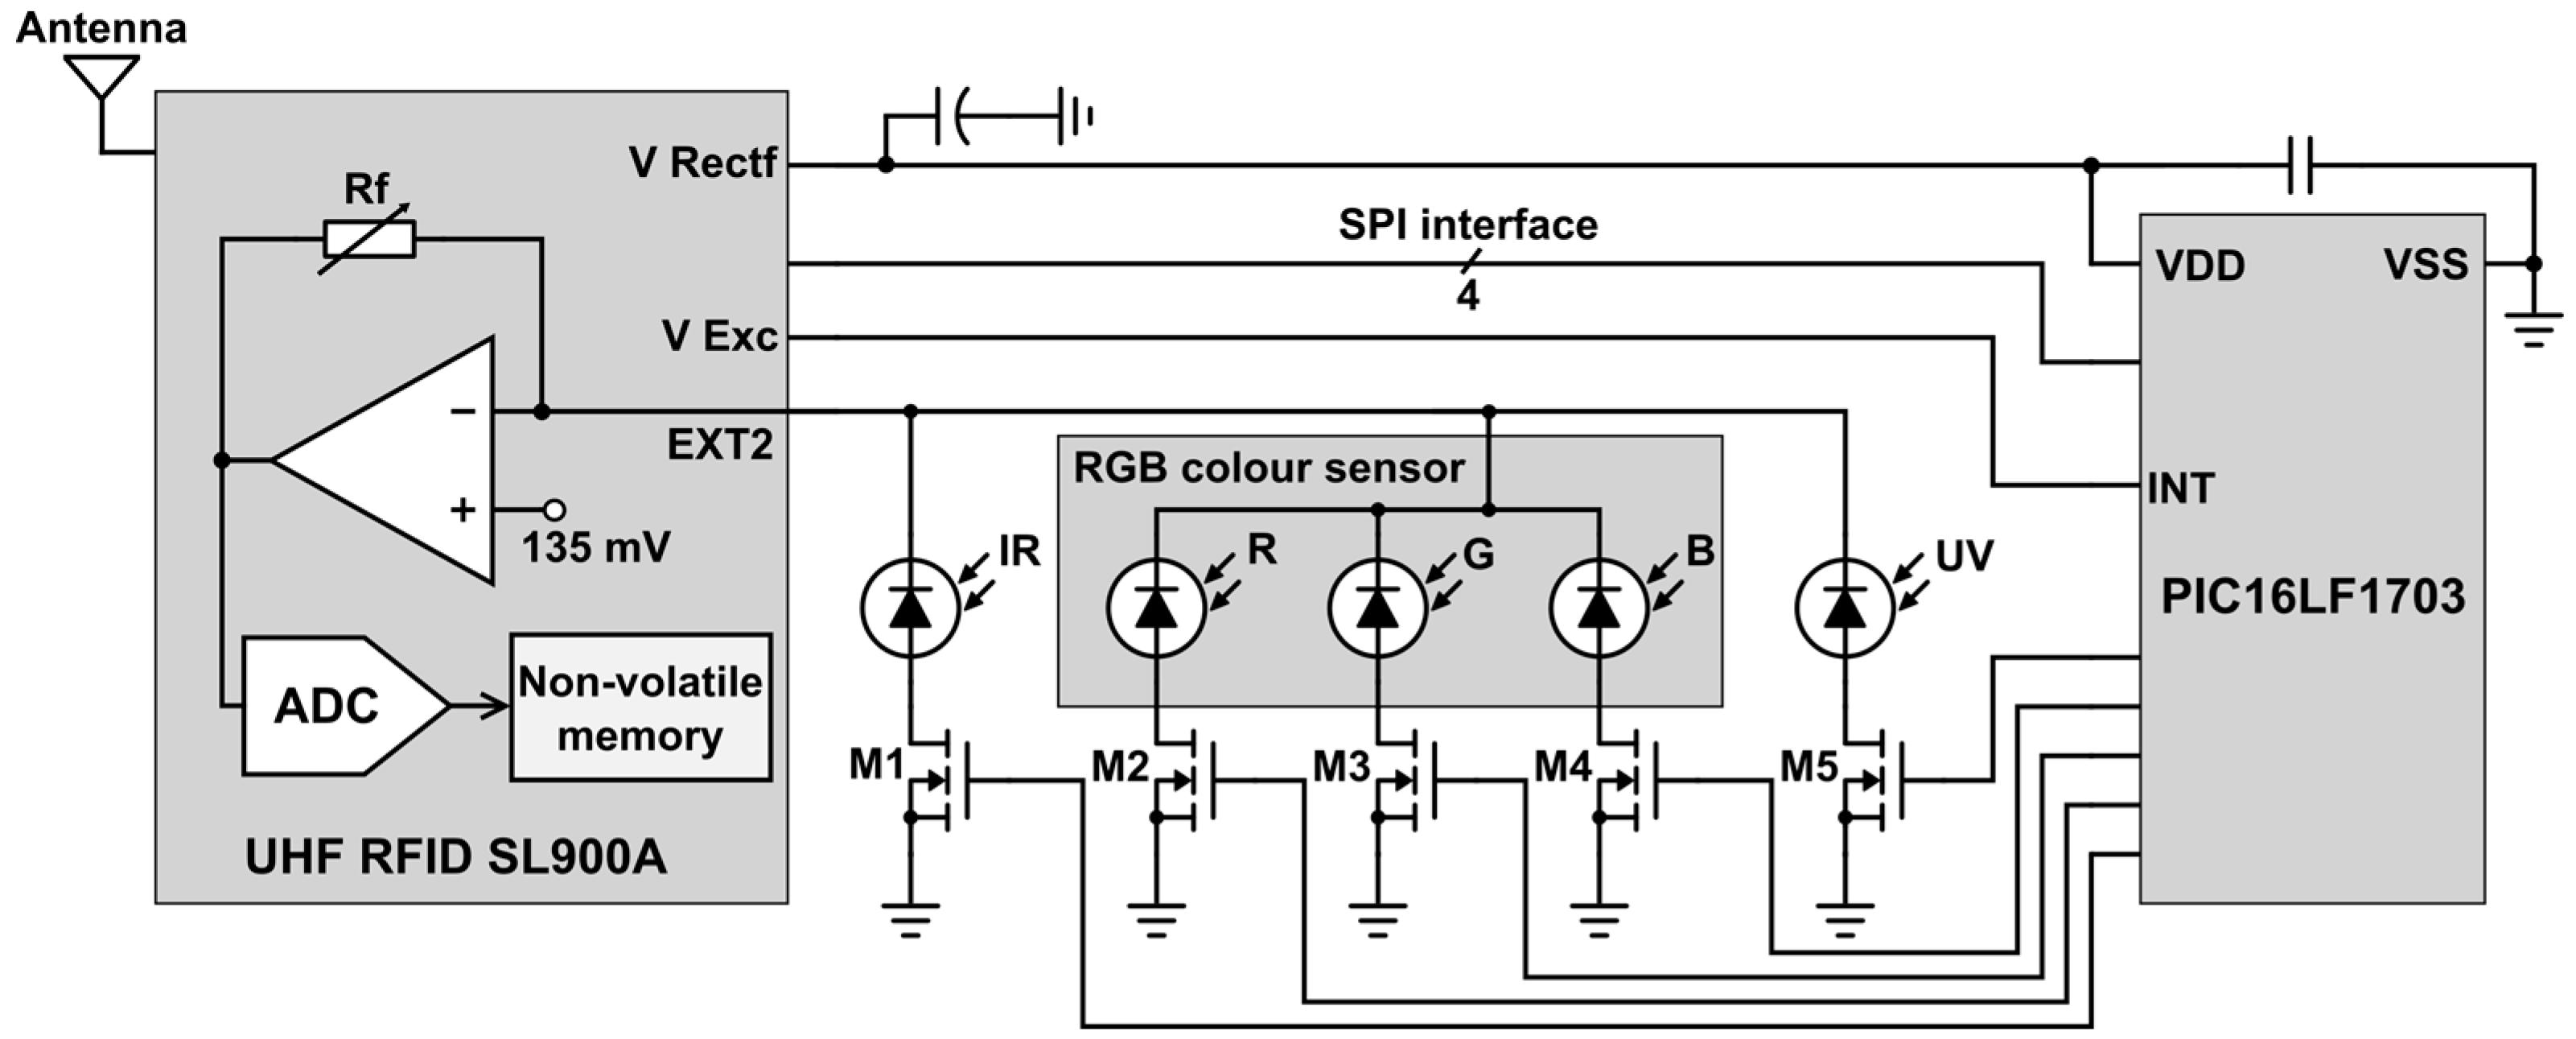 Passive Tag Rfid Circuit Application Wiring Diagram Sensors Free Full Text Uhf For Multispectral Rh Mdpi Com Military Tags Datasheet